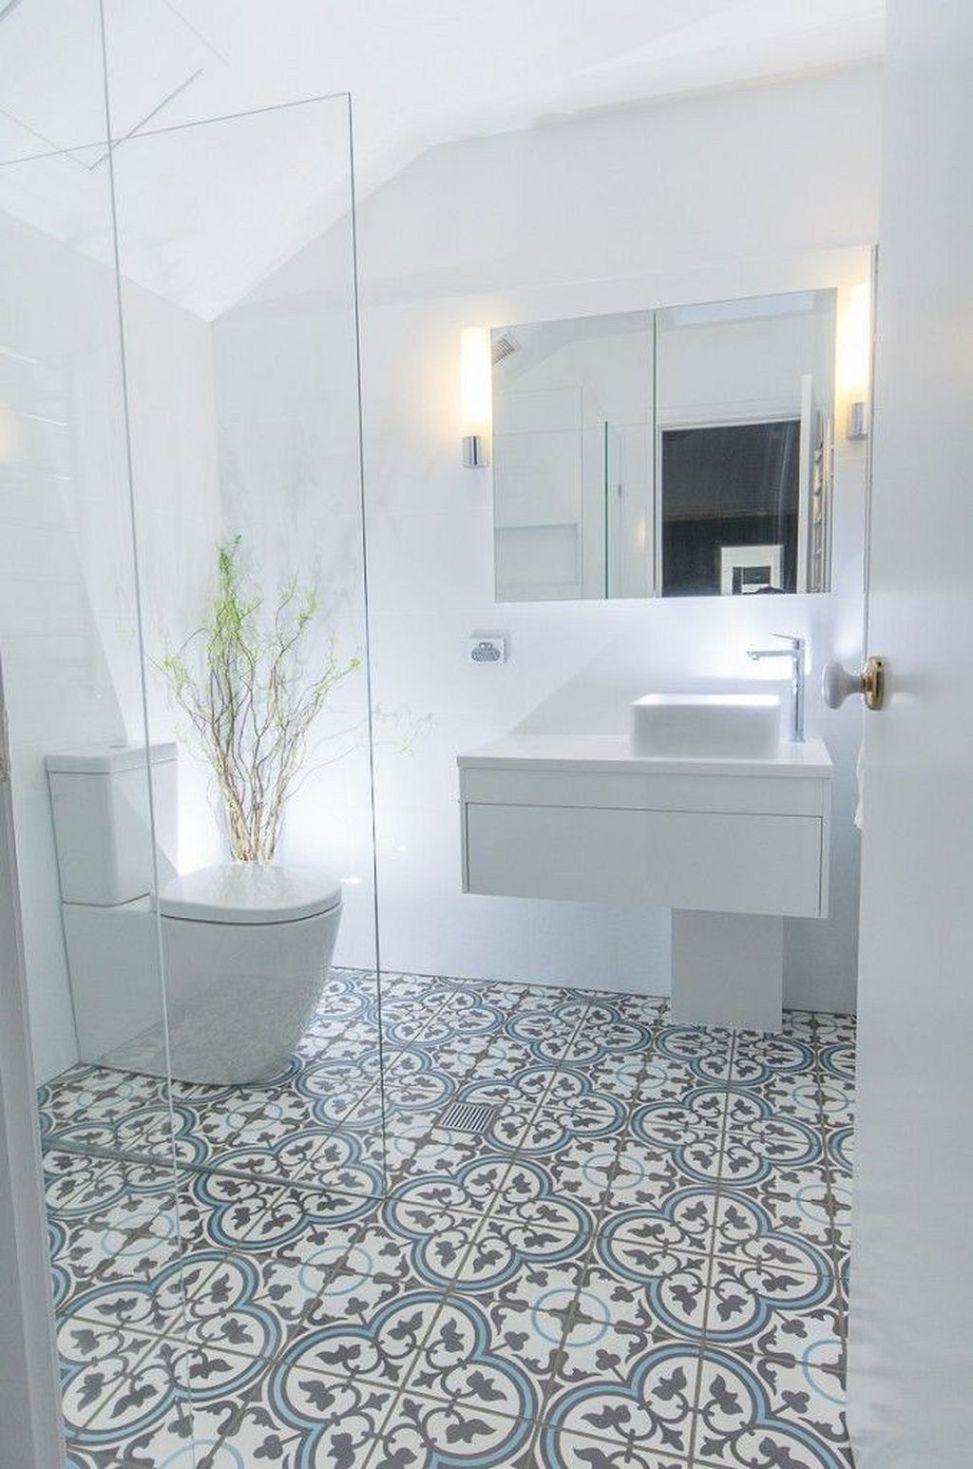 Latest Trends In Bathroom Tile Design (45) | Pinterest | Tile design ...